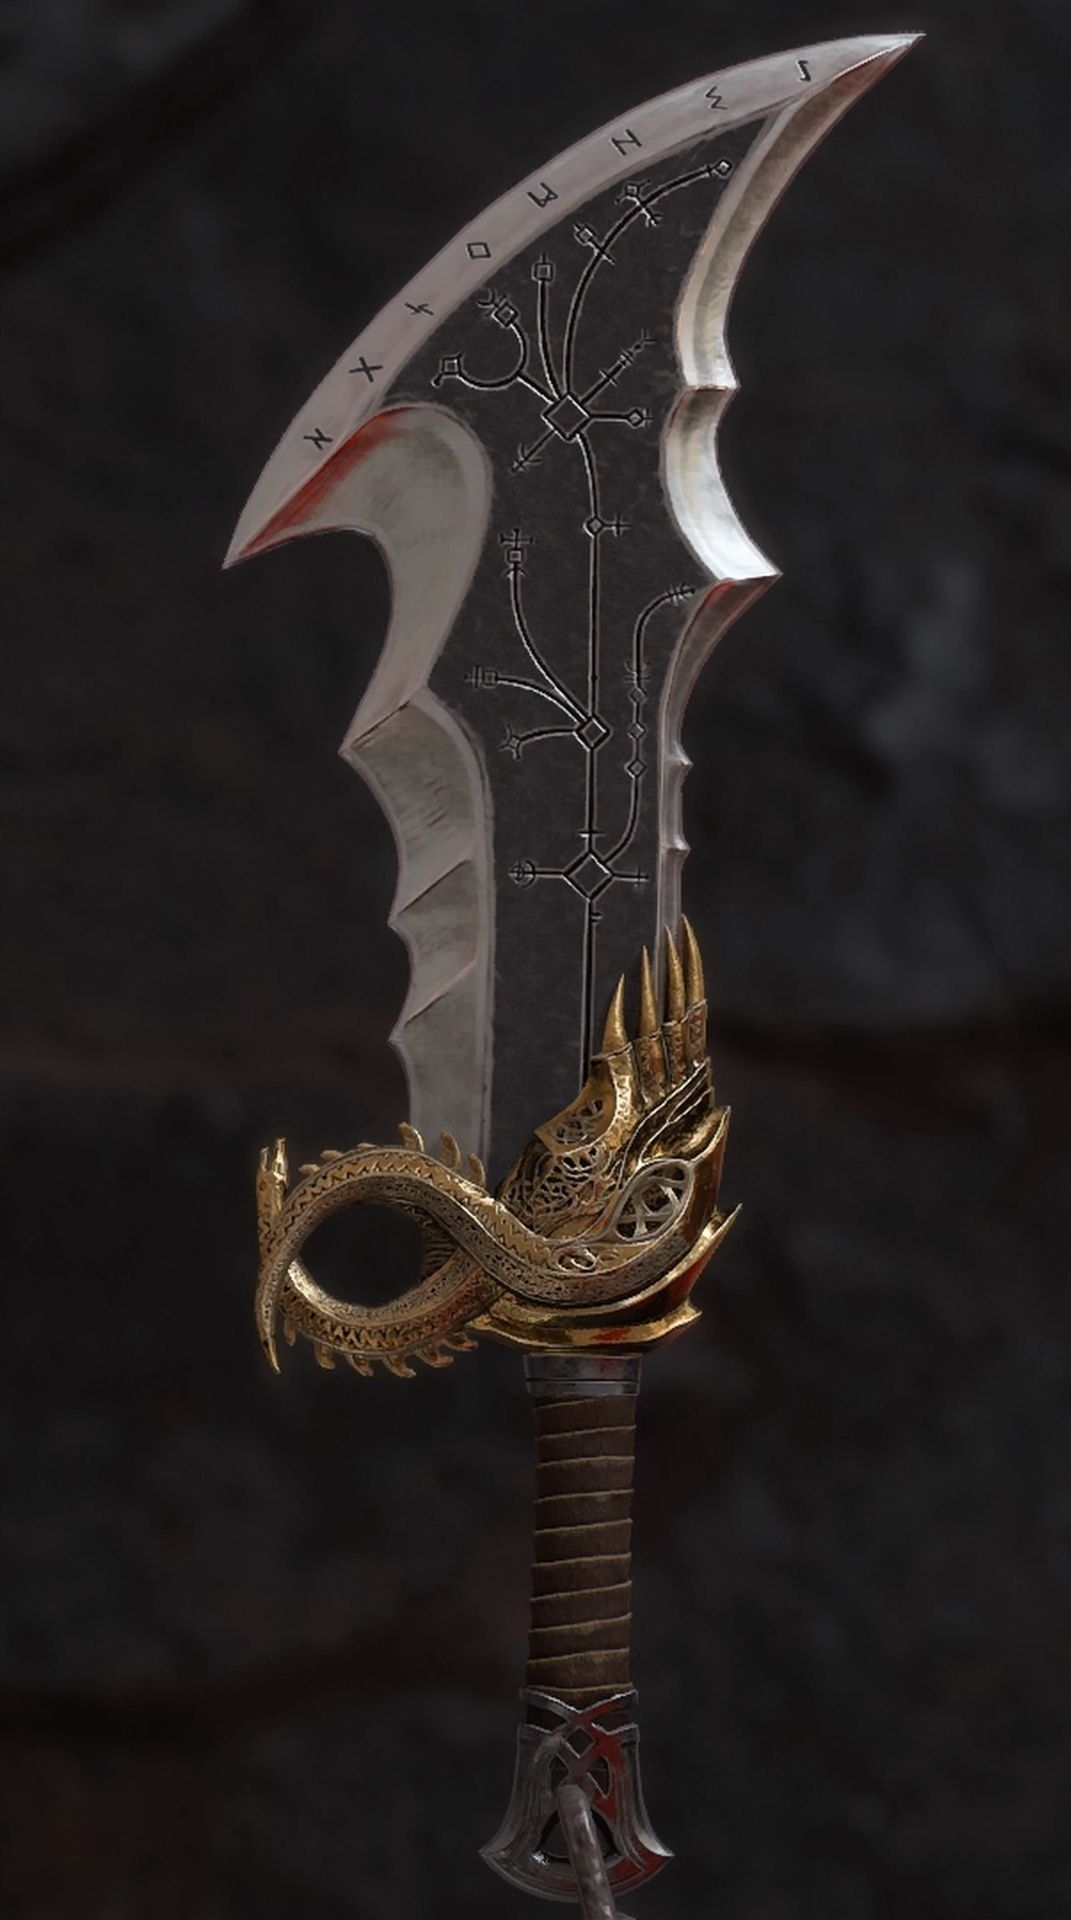 The High School Rider Kratos God Of War God Of War Greek God Of War God of war blades of chaos wallpaper